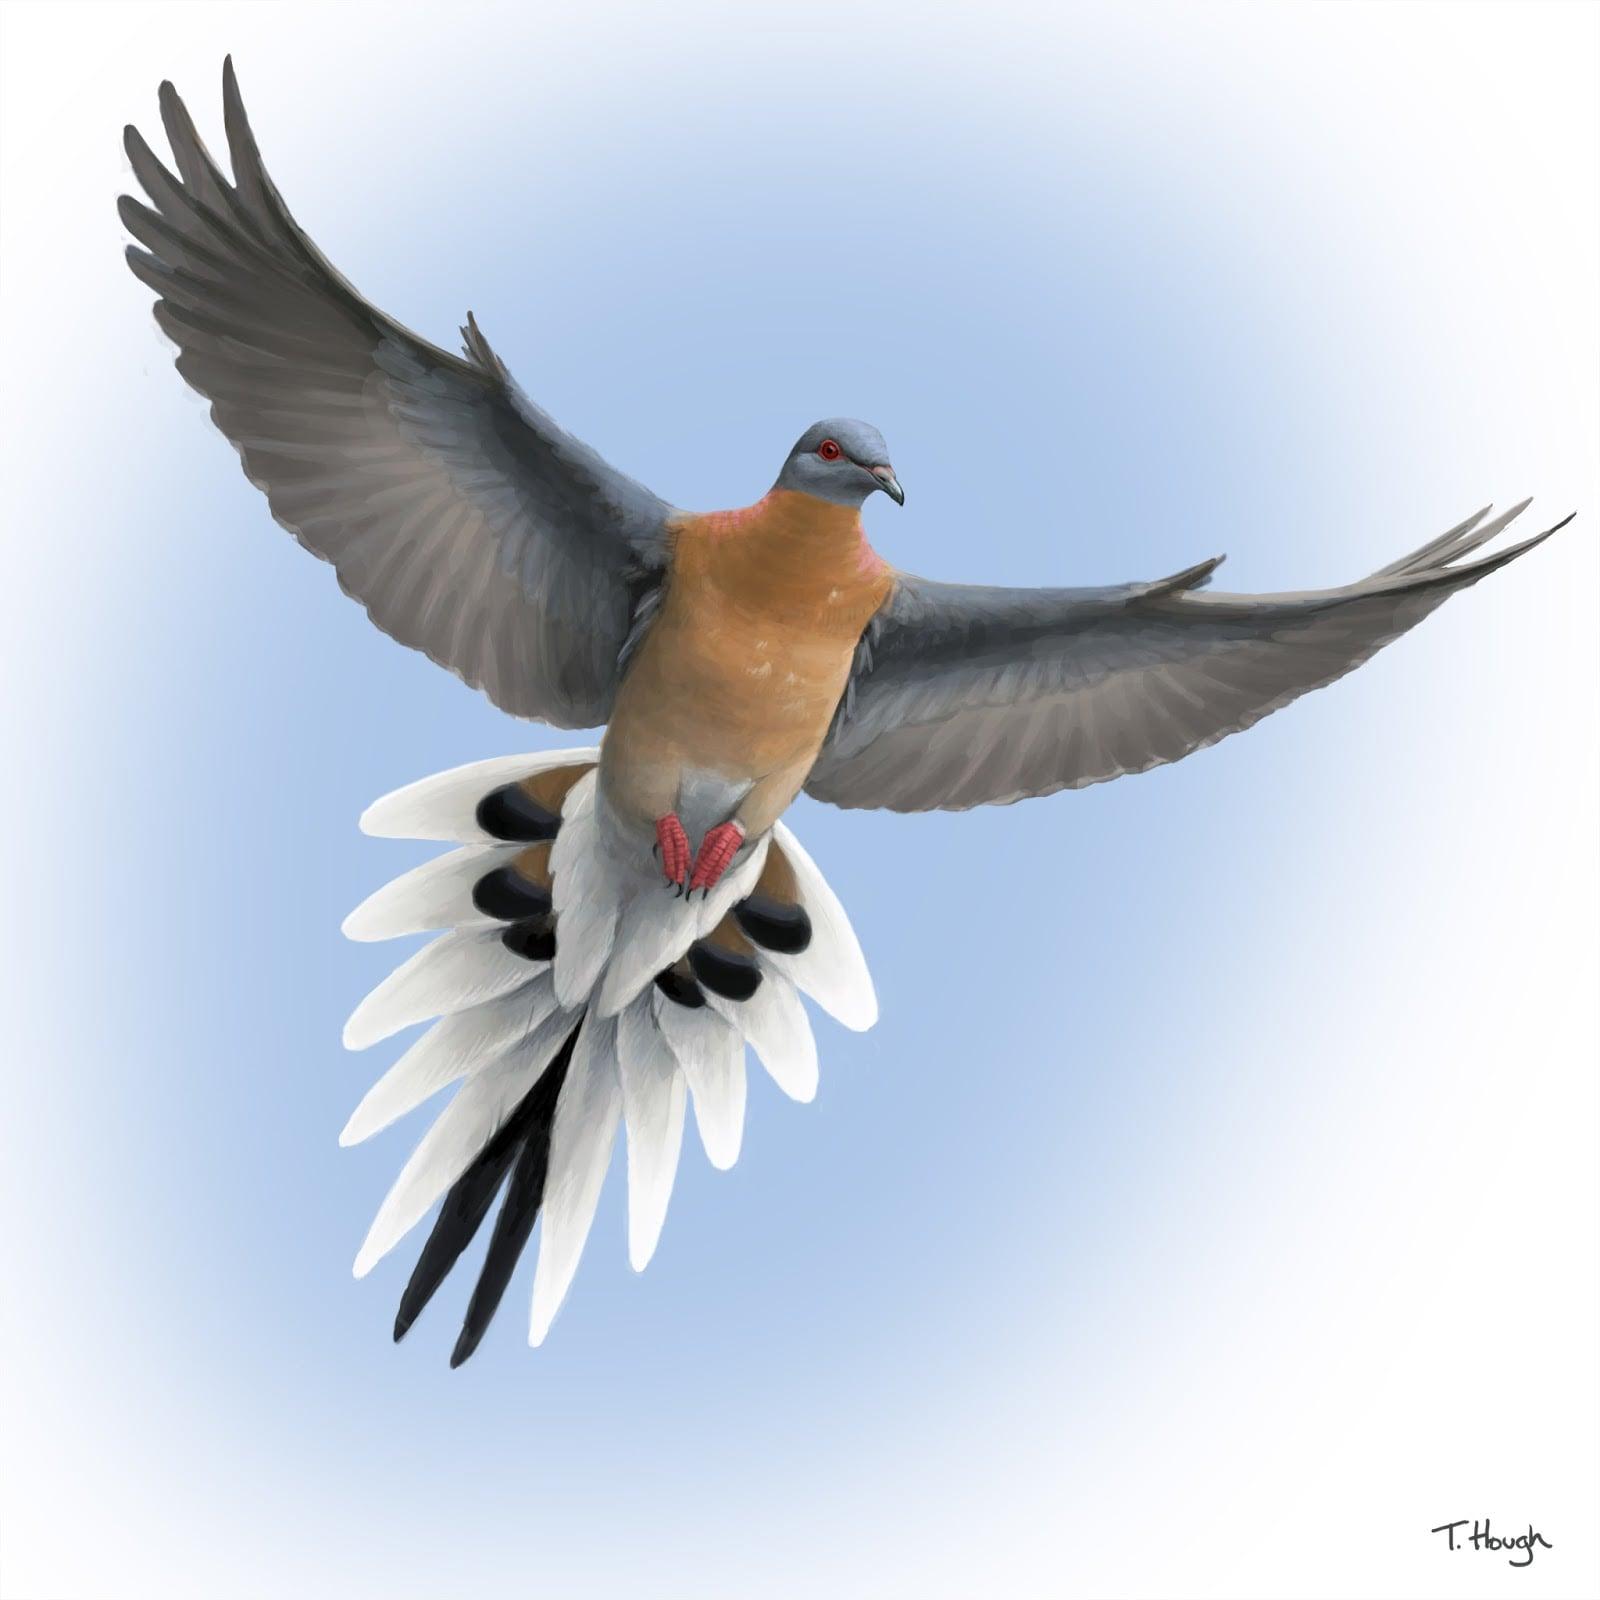 passenger_pigeon_in_flight.jpg